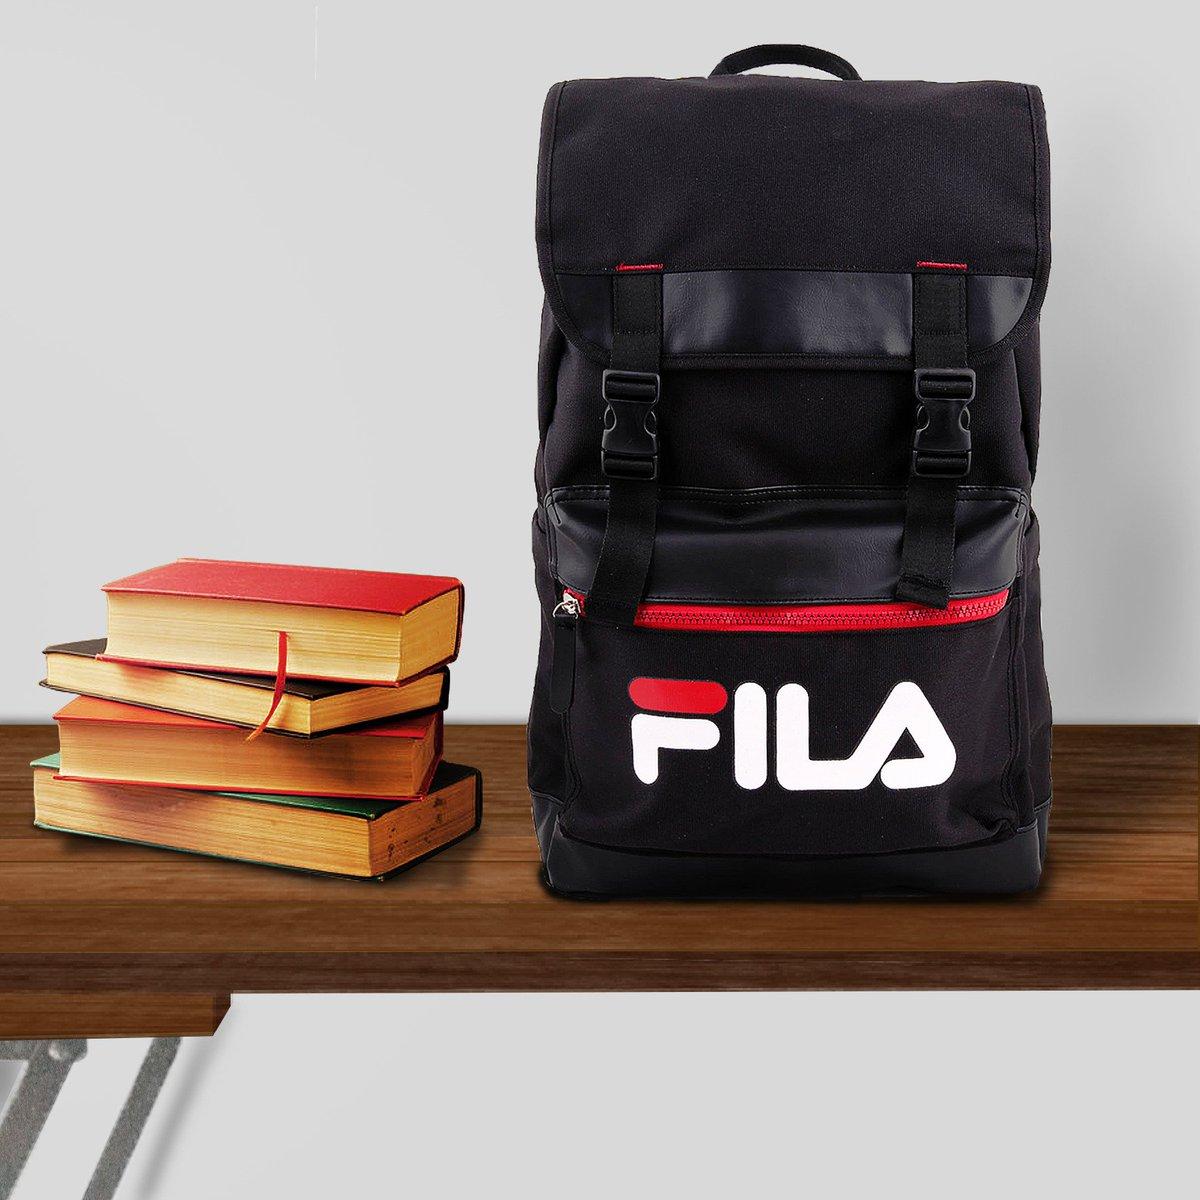 0aff39bddaaf  Filaindonesia  fila  filausa  filaitaly  filabags  bag  stylish  backpack   sportypic.twitter.com pSvKHqUUE5